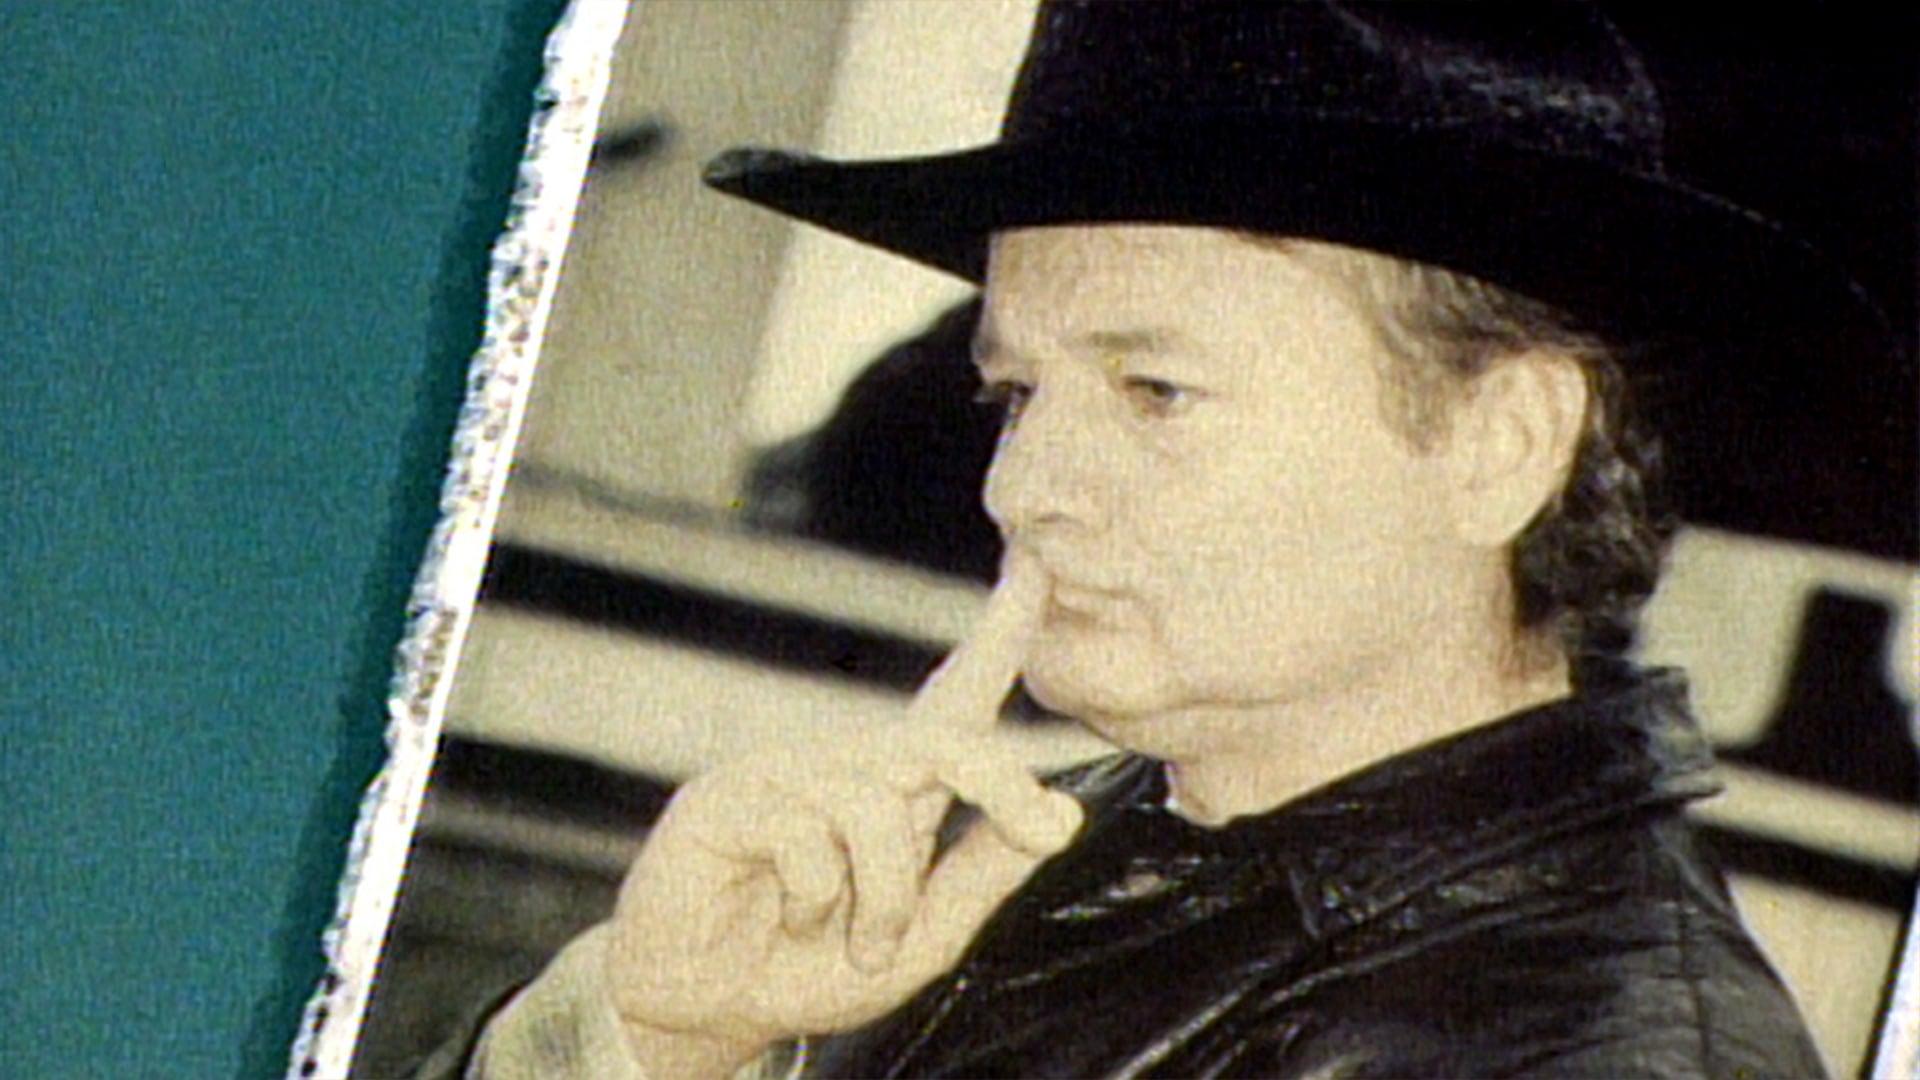 Bill Murray: February 20, 1993